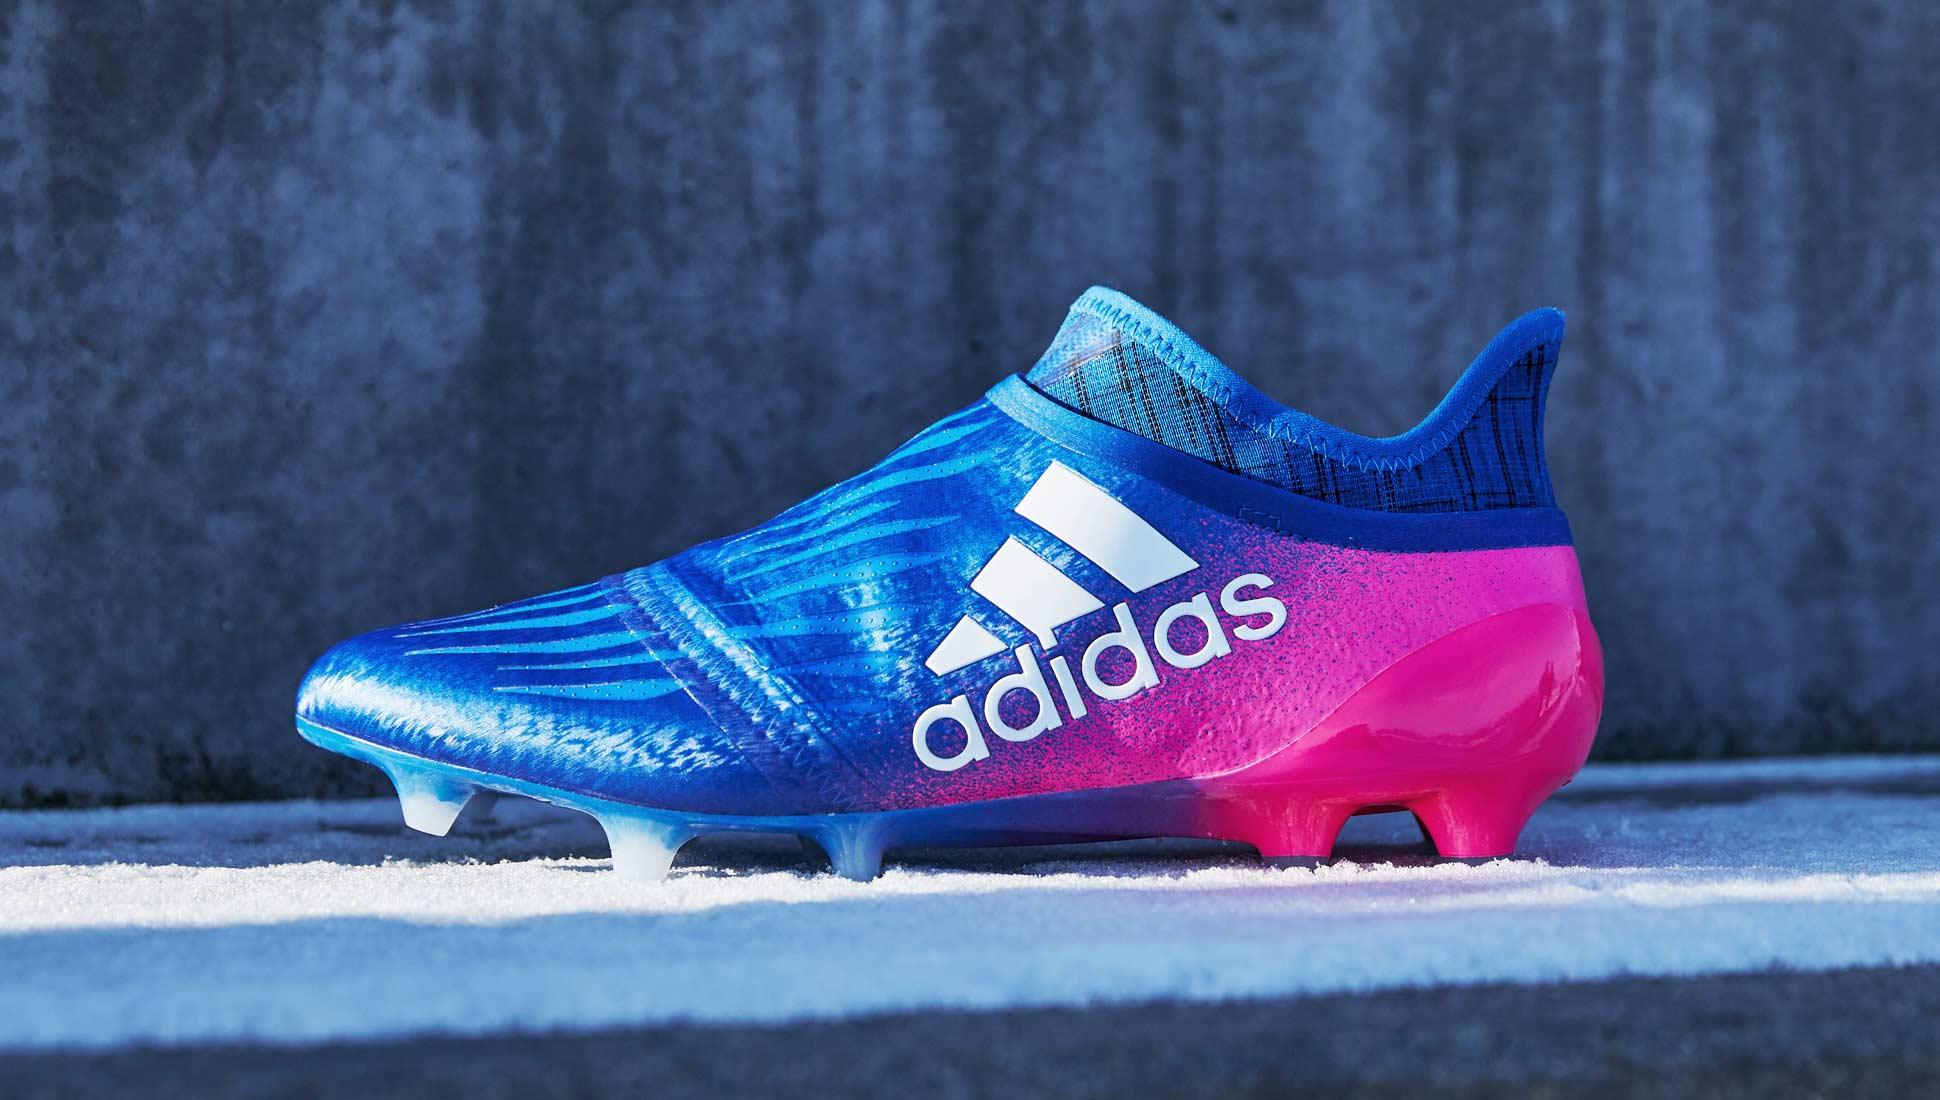 adidas x 16 purechaos football boots soccerbible. Black Bedroom Furniture Sets. Home Design Ideas